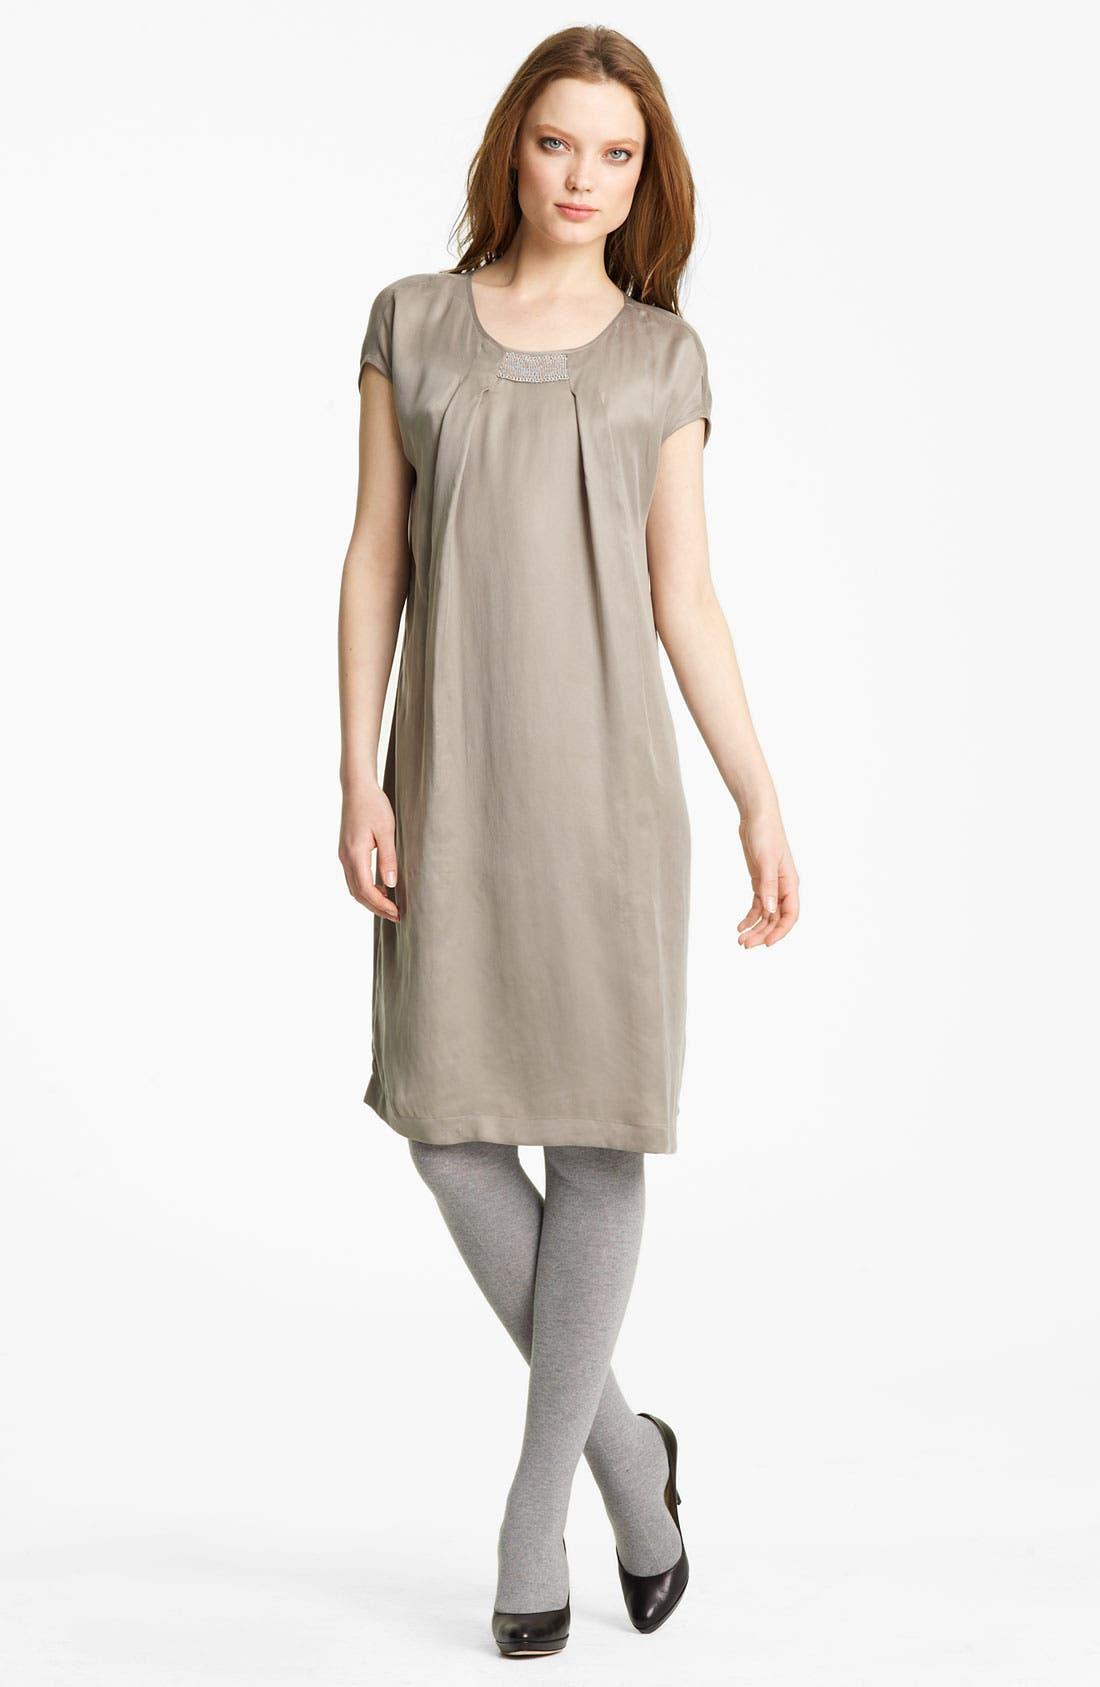 Alternate Image 1 Selected - Fabiana Filippi Embroidered Neck Dress